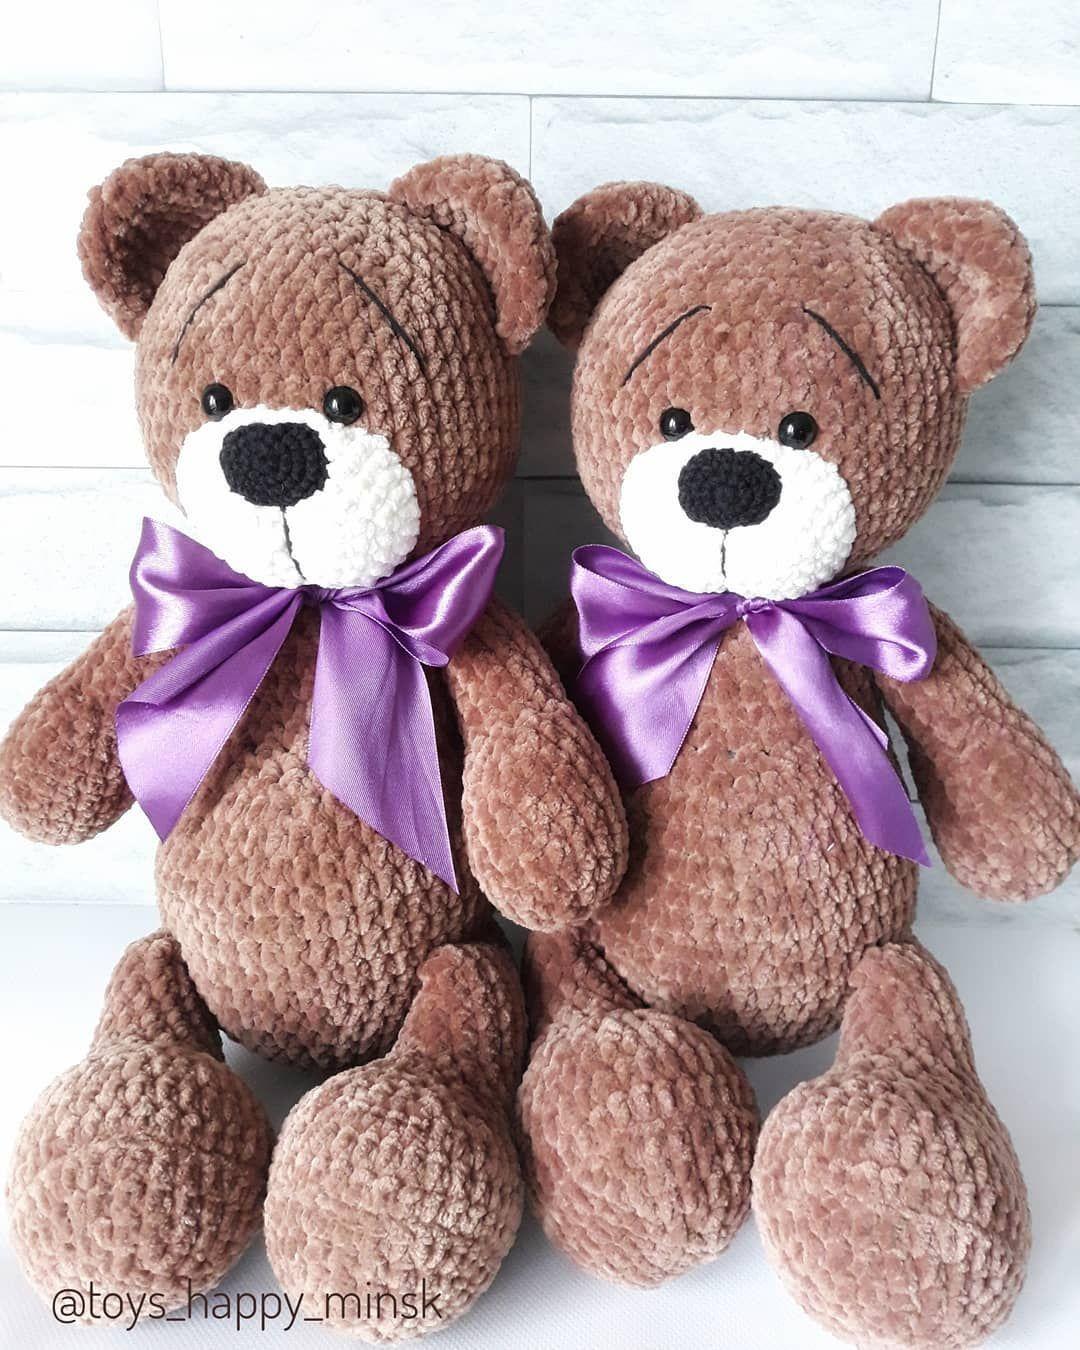 Amigurumi plush bear pattern #crochetbearpatterns